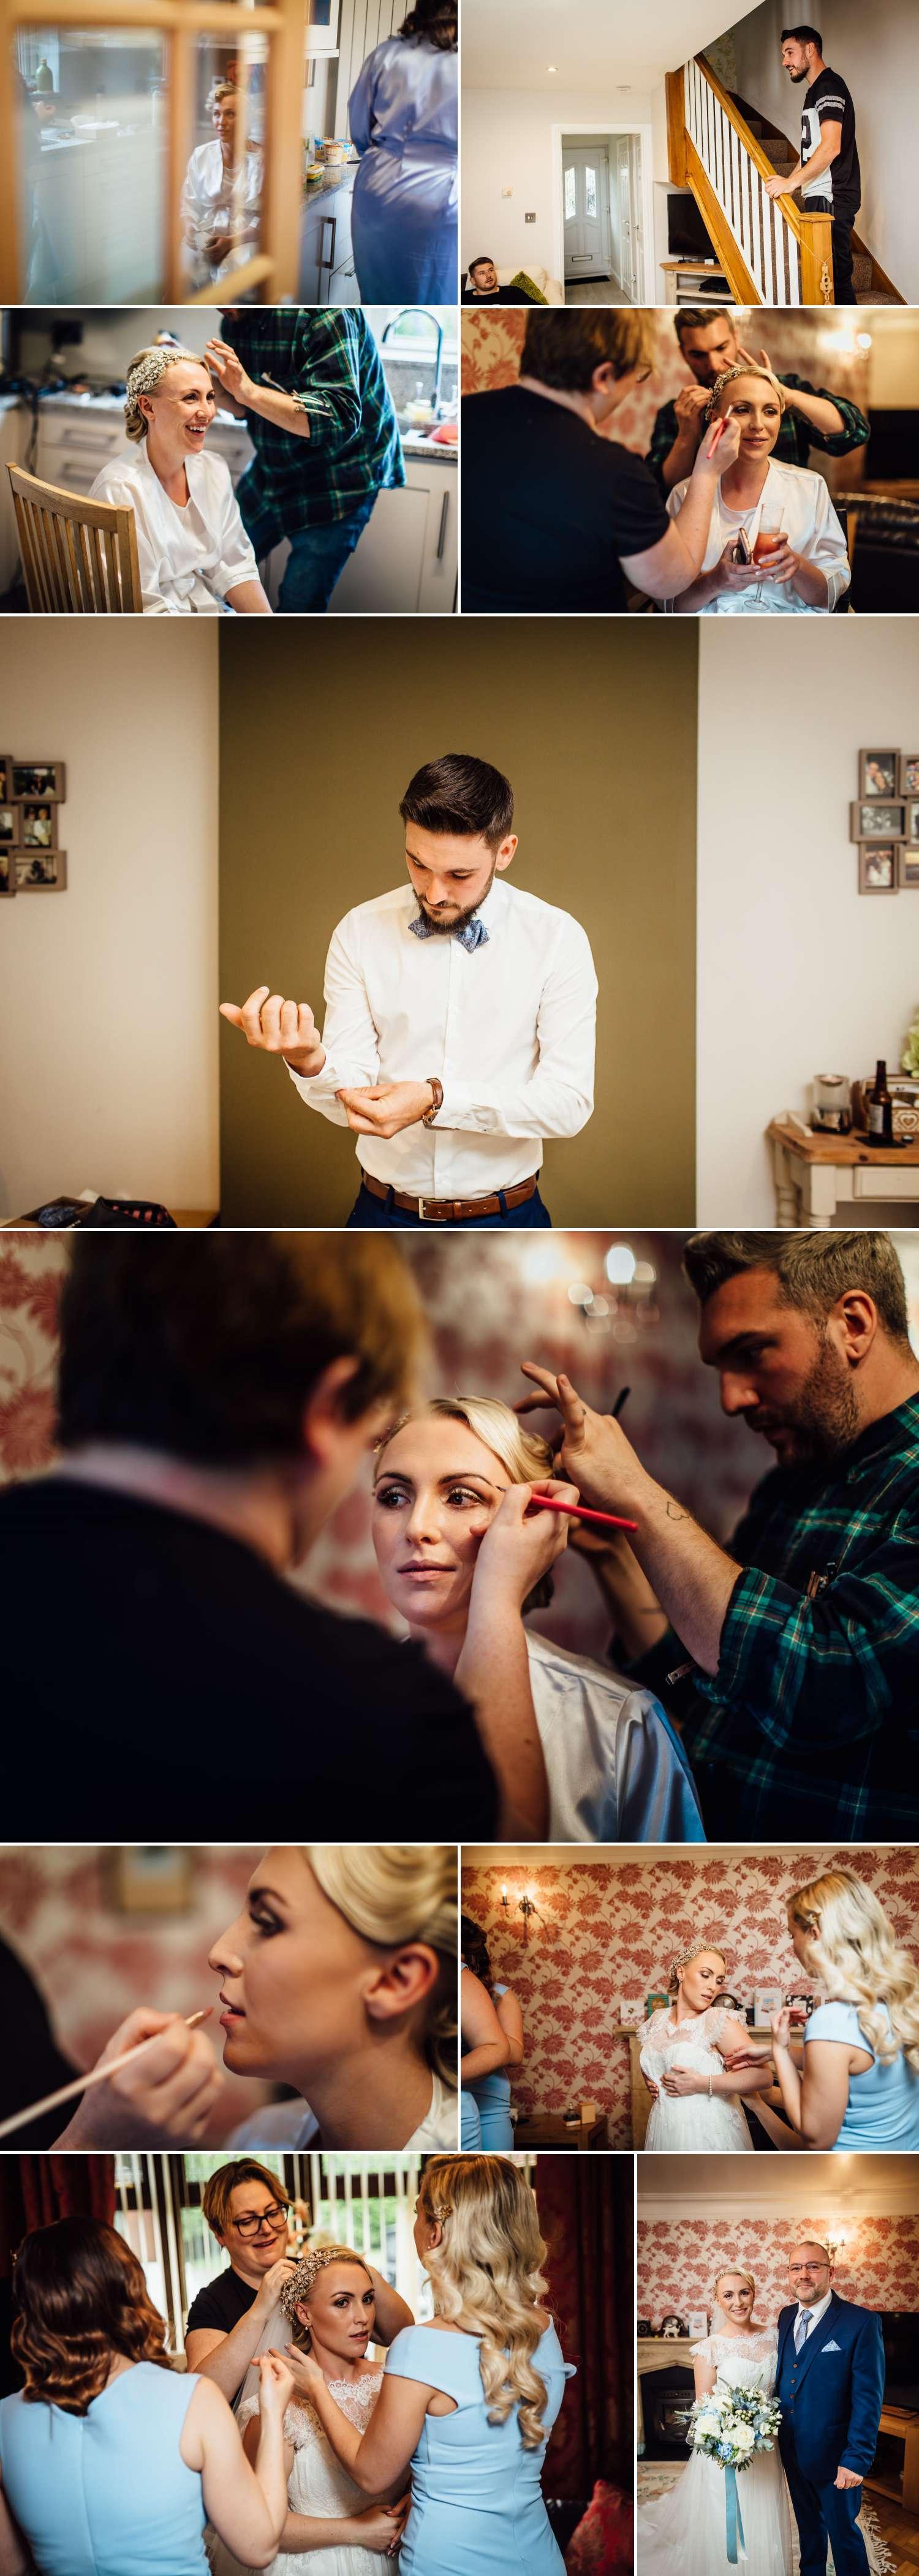 Wedding Photographs of Groom getting ready